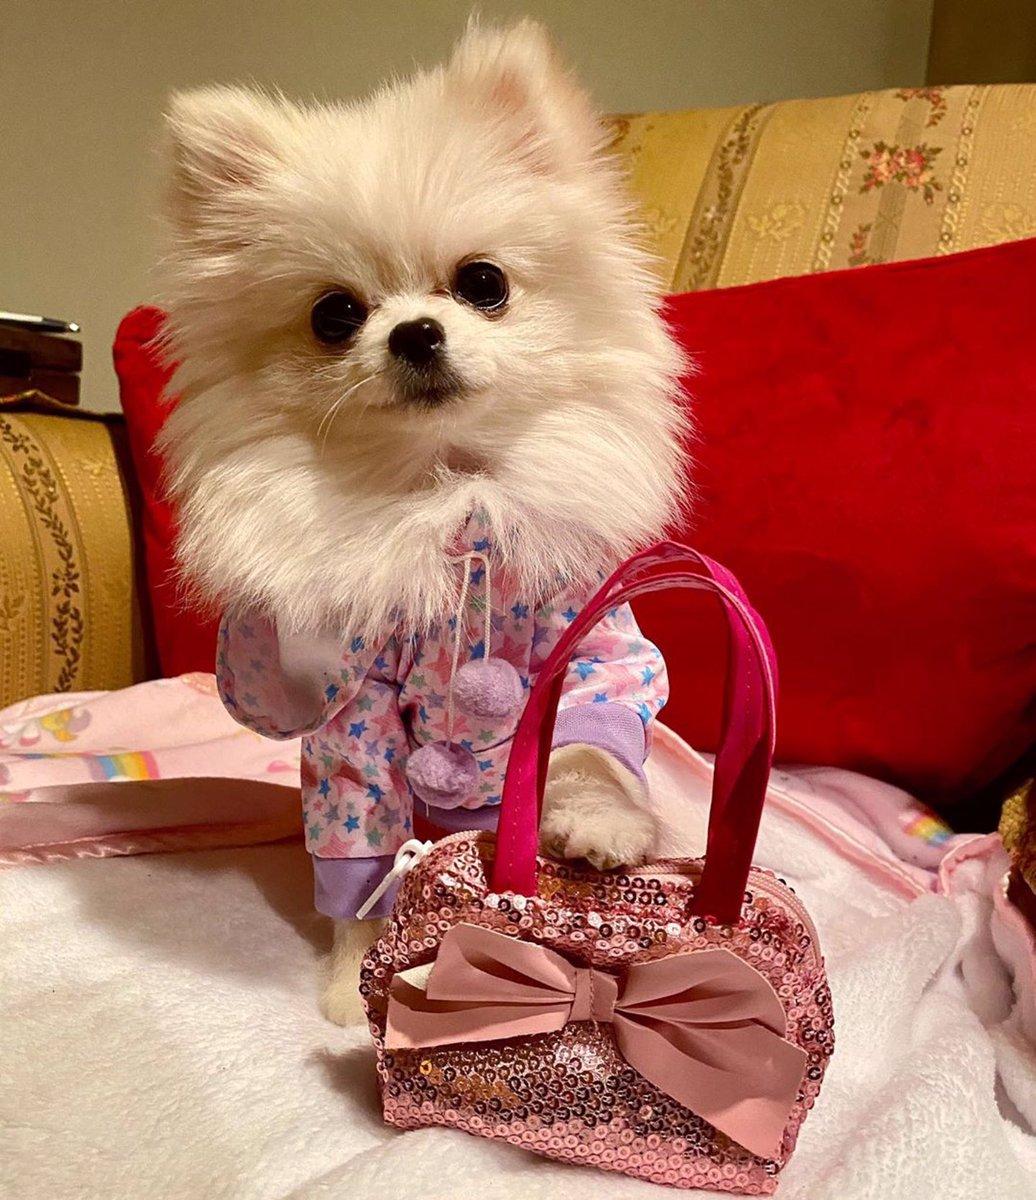 It's called fashion sweetie. Look it up!  (@bebecitathepom)  #fashion #dog #thedailypomeranianpic.twitter.com/KR2c7ALJiZ